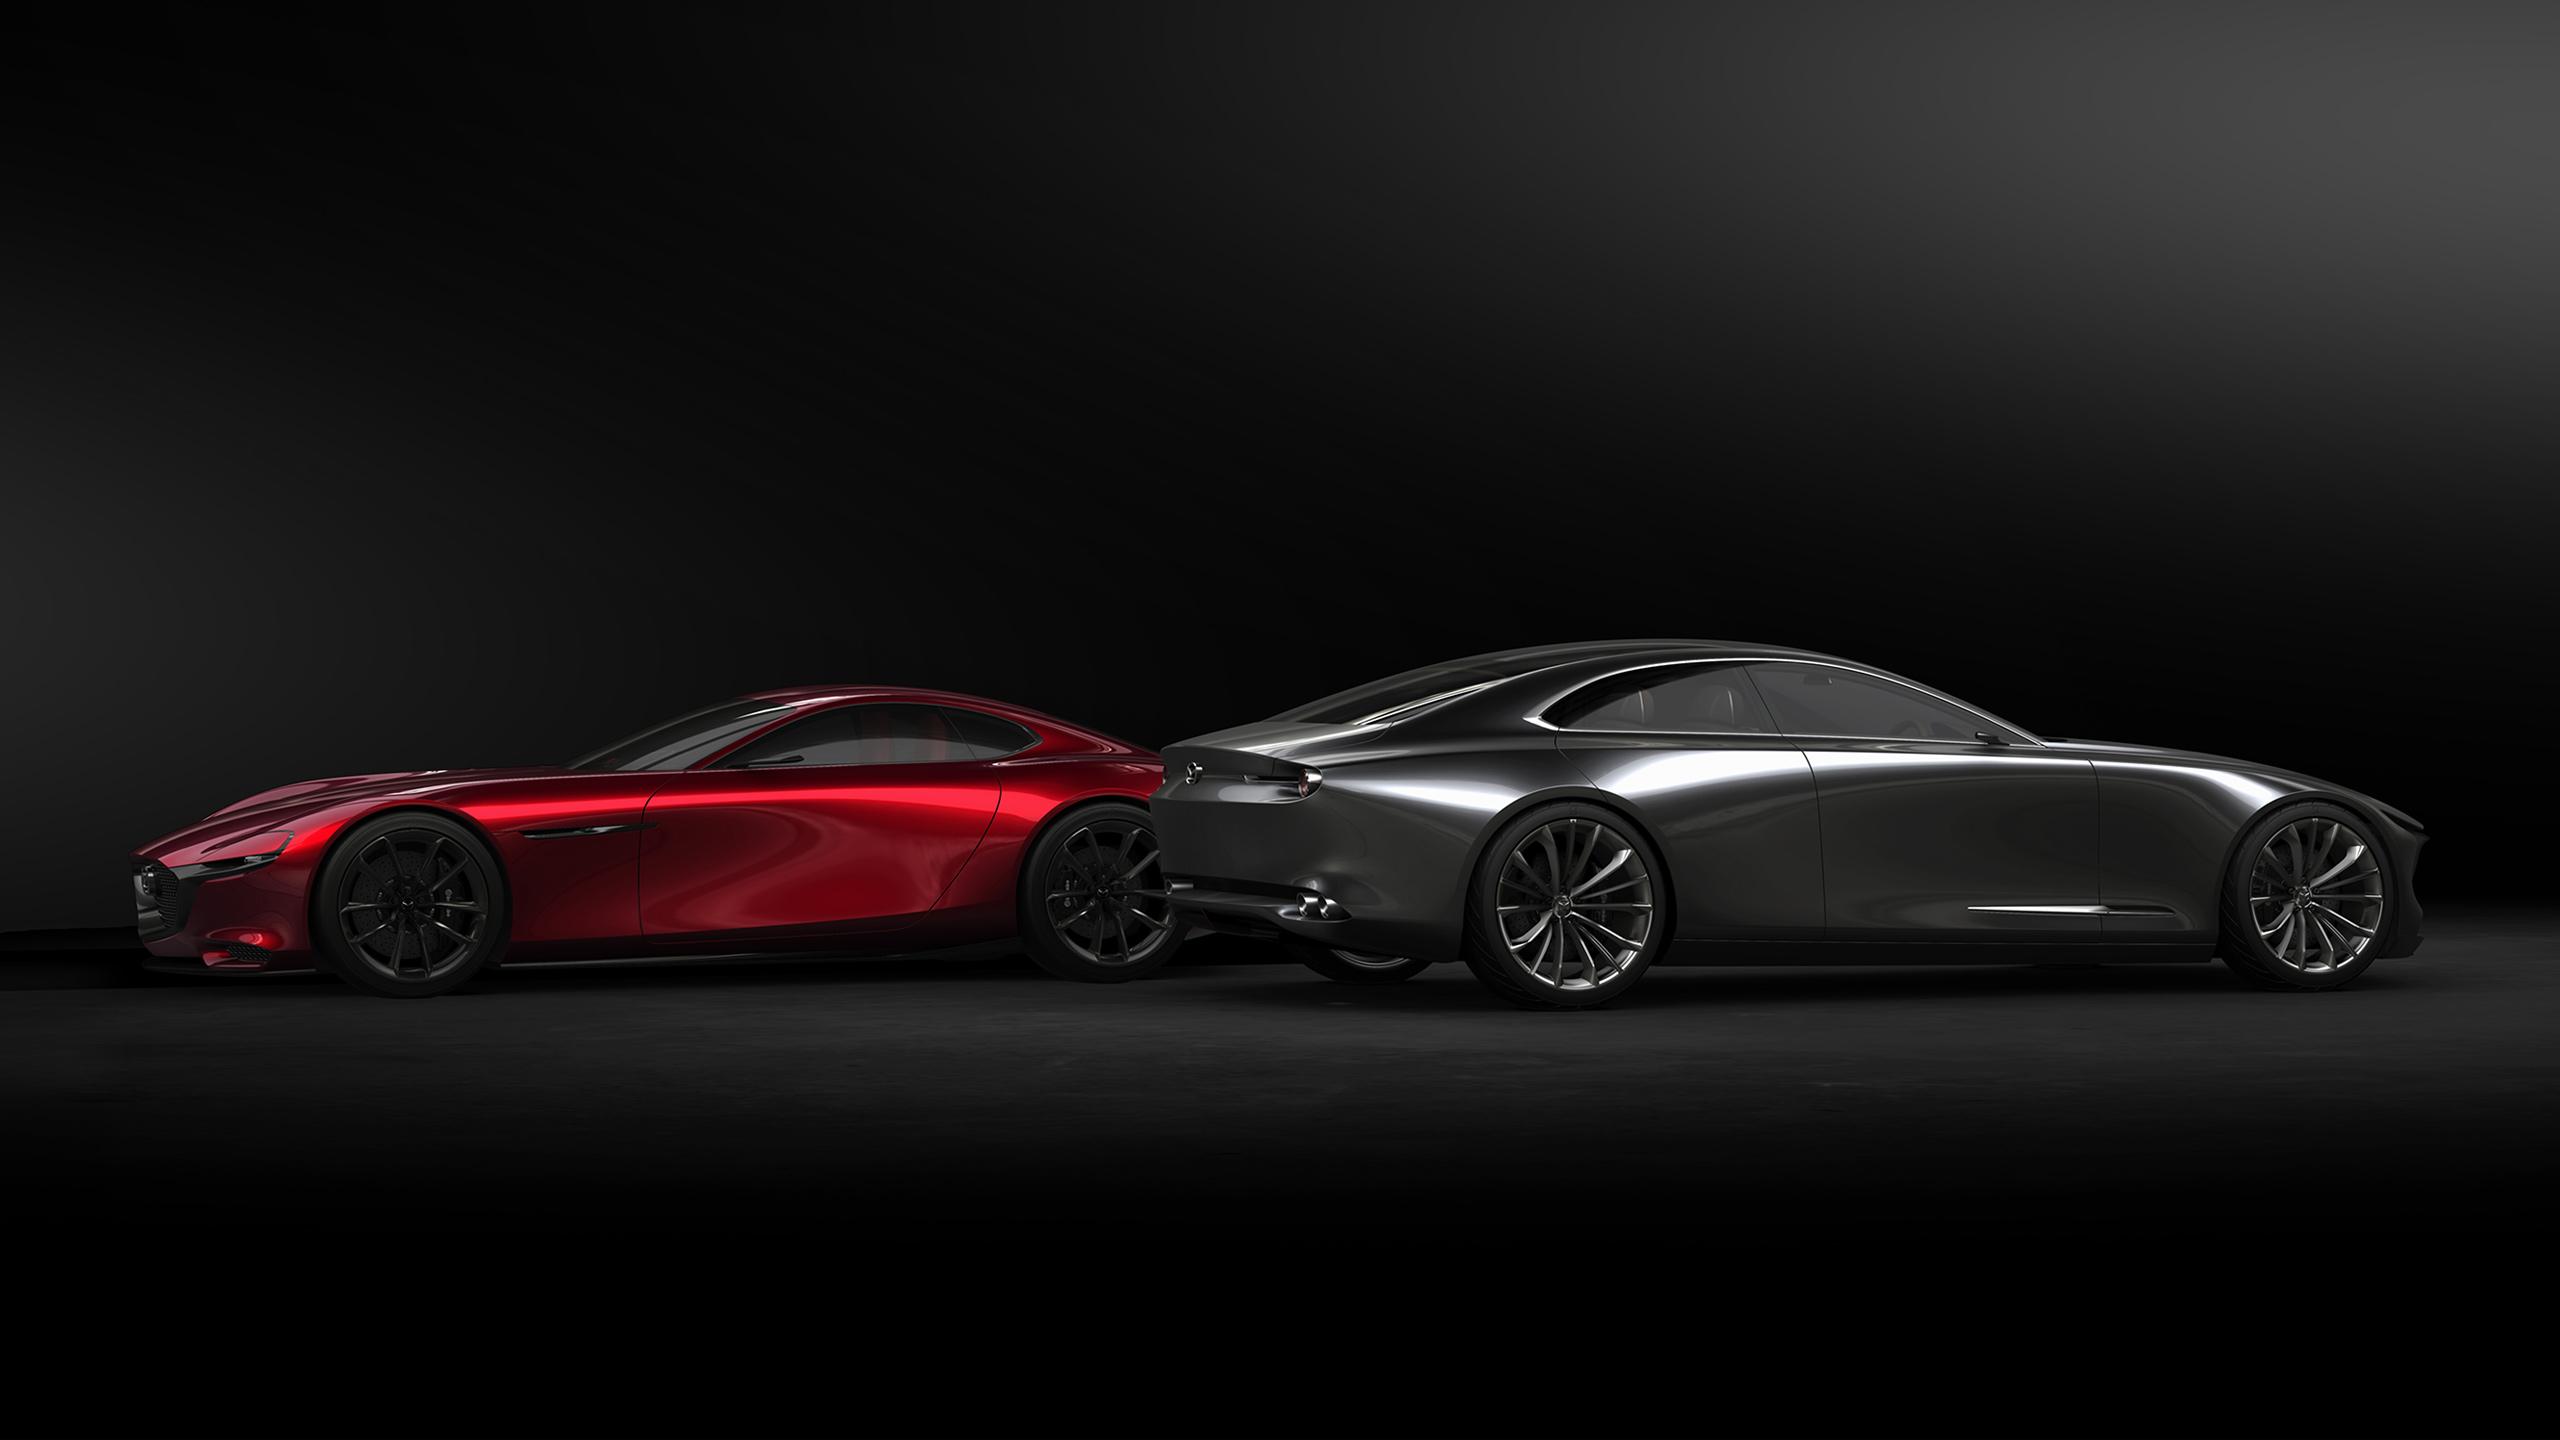 xe-concept-mazda-rx-vision-mazda-vision-coupe.jpg